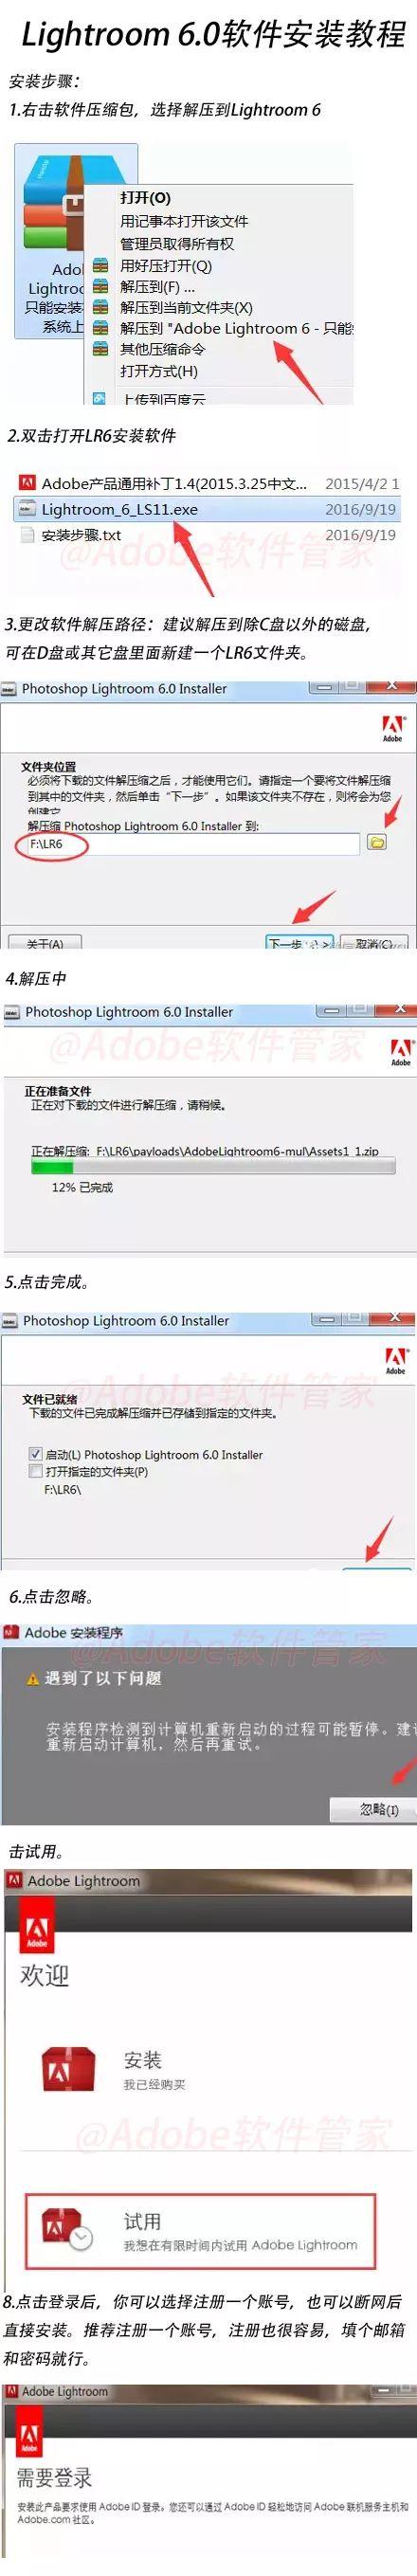 【Adobe软件大全】Lightroom 6.0软件百度云盘资源/安装教程